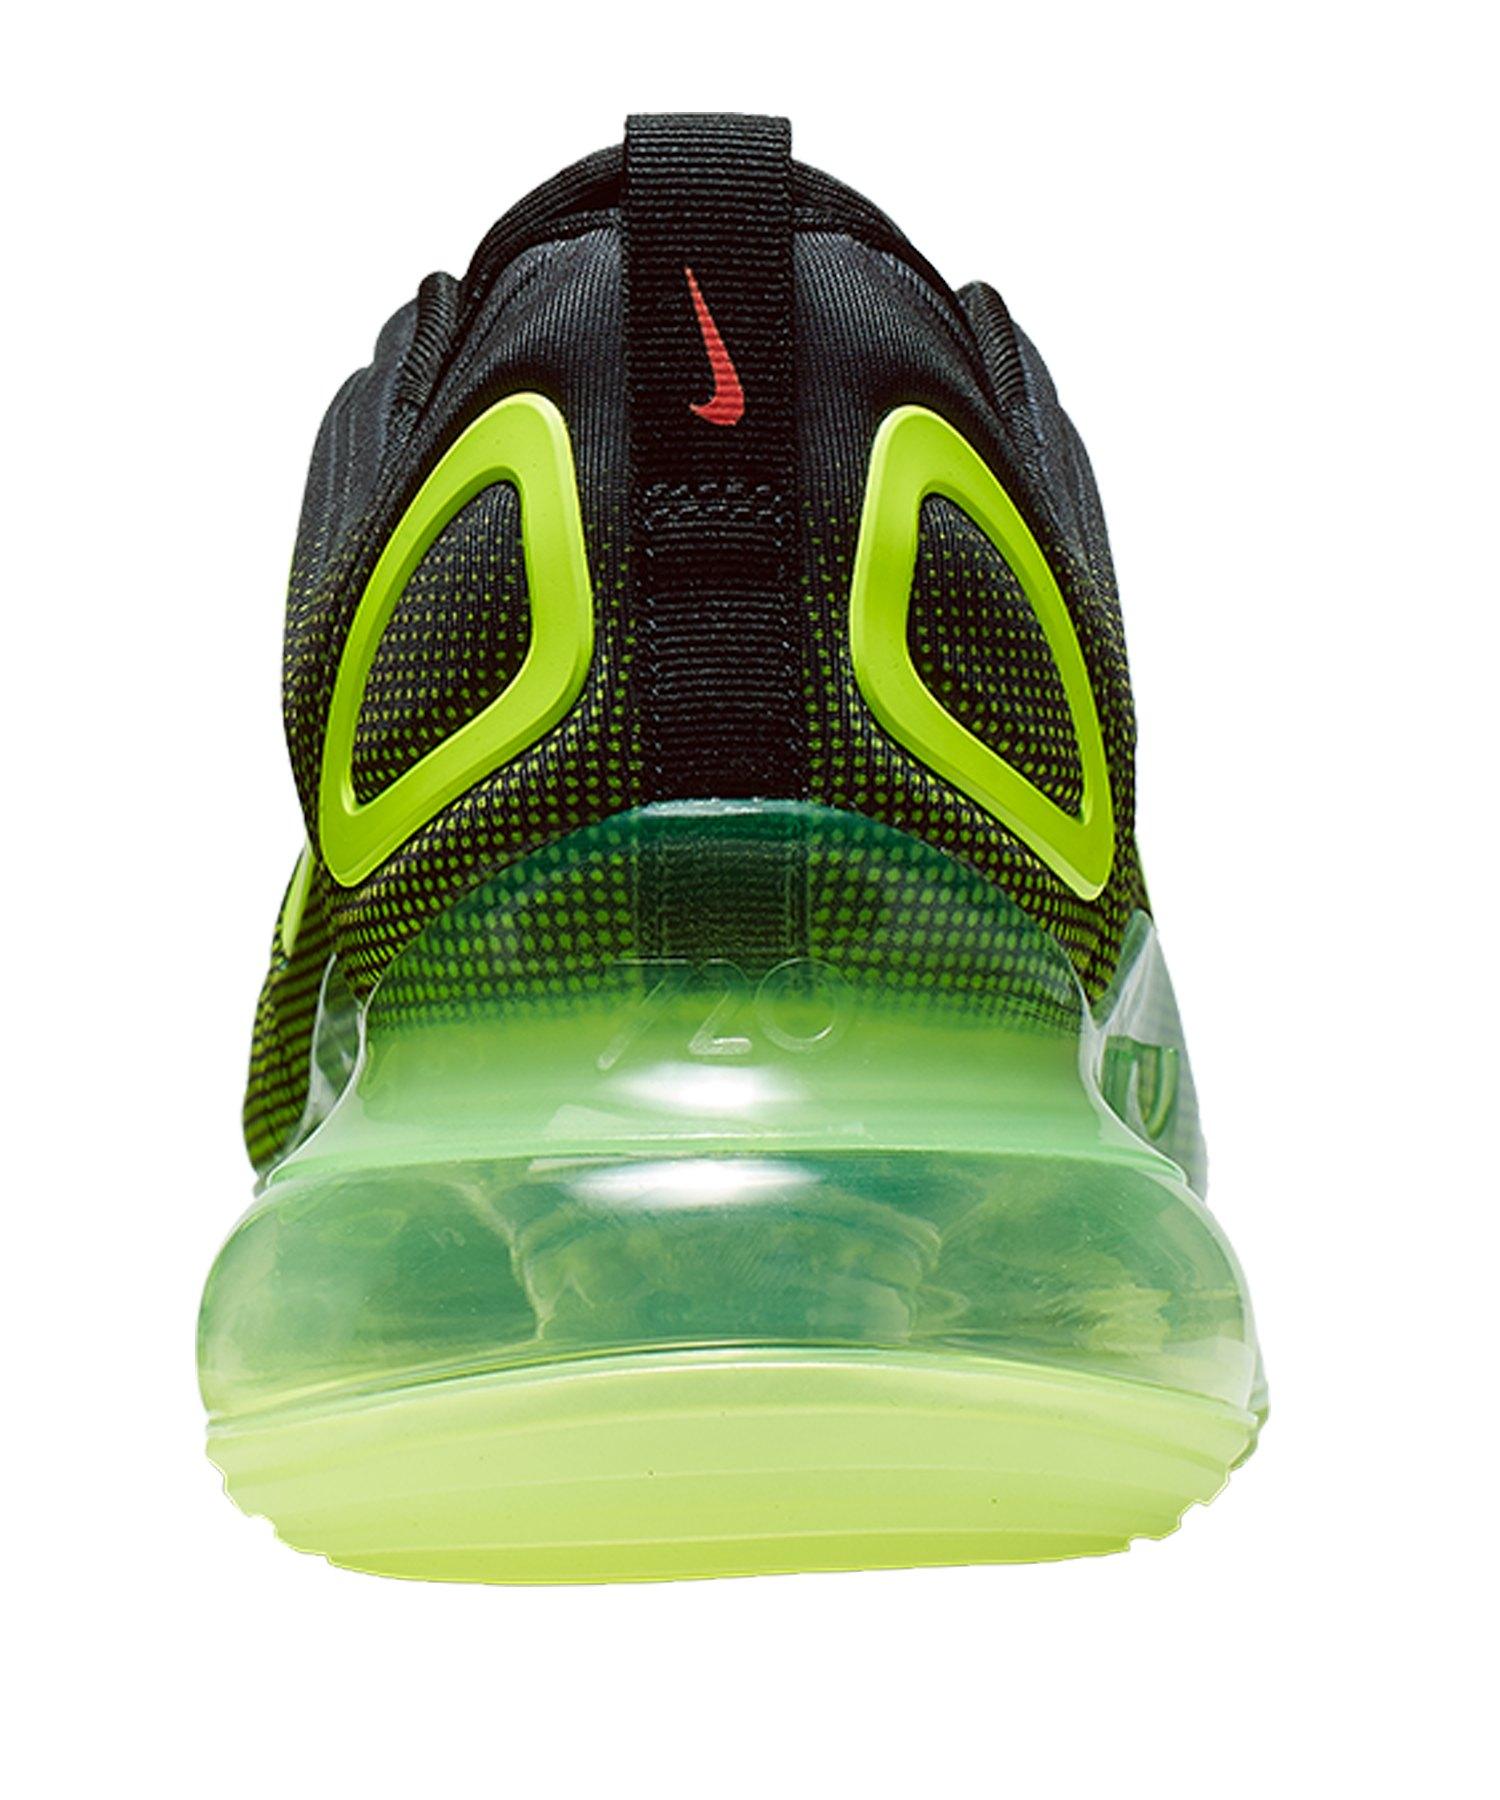 Max F008 Nike Schwarz Sneaker Gelb 720 Air EW9I2DH